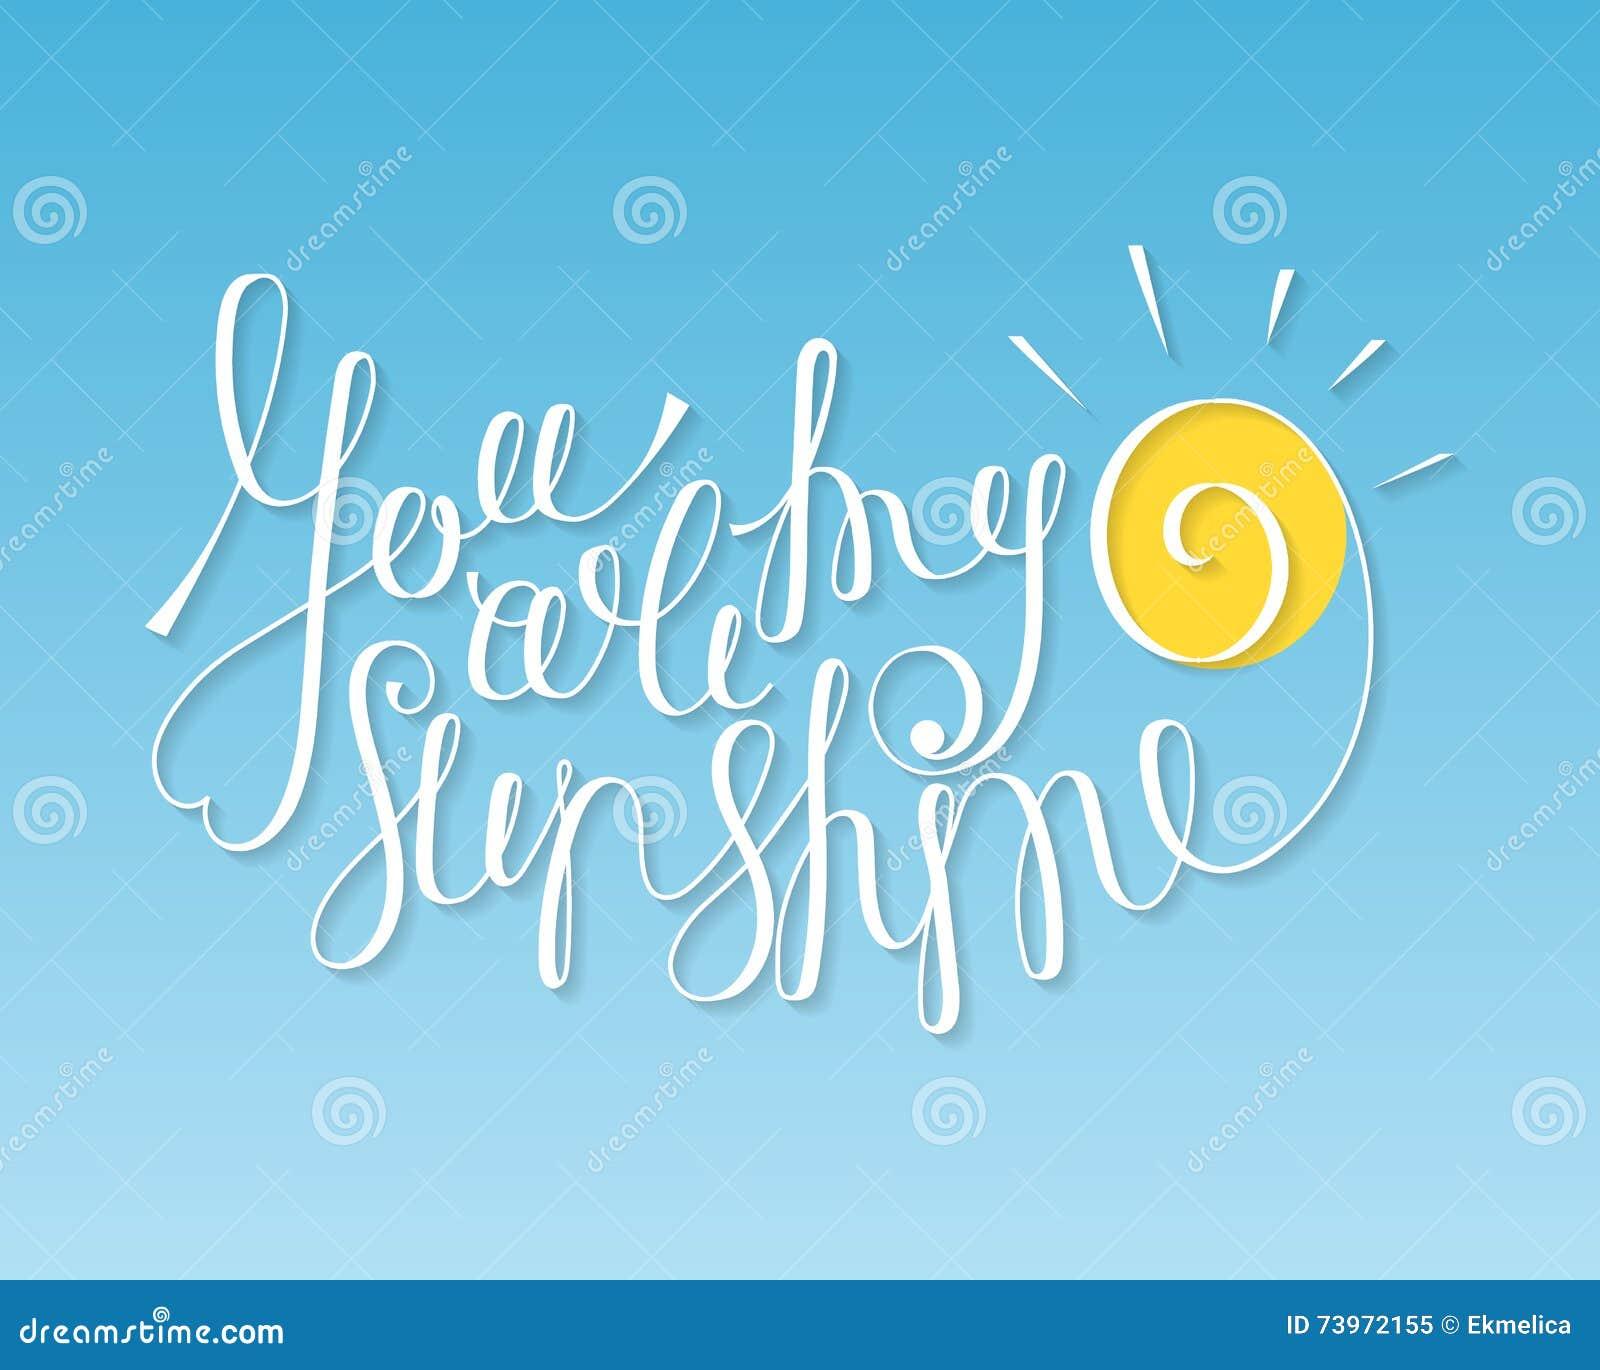 You are my sunshine inscription stock vector